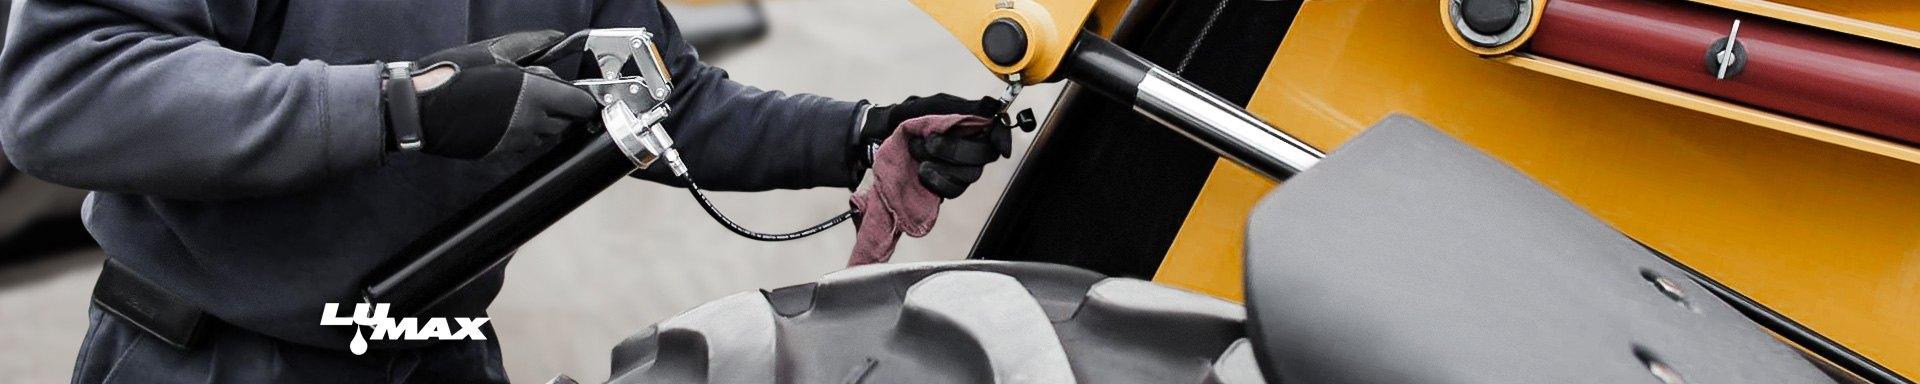 Lumax LX-1322 Gray Premium Dual-Direction Barrel Pump